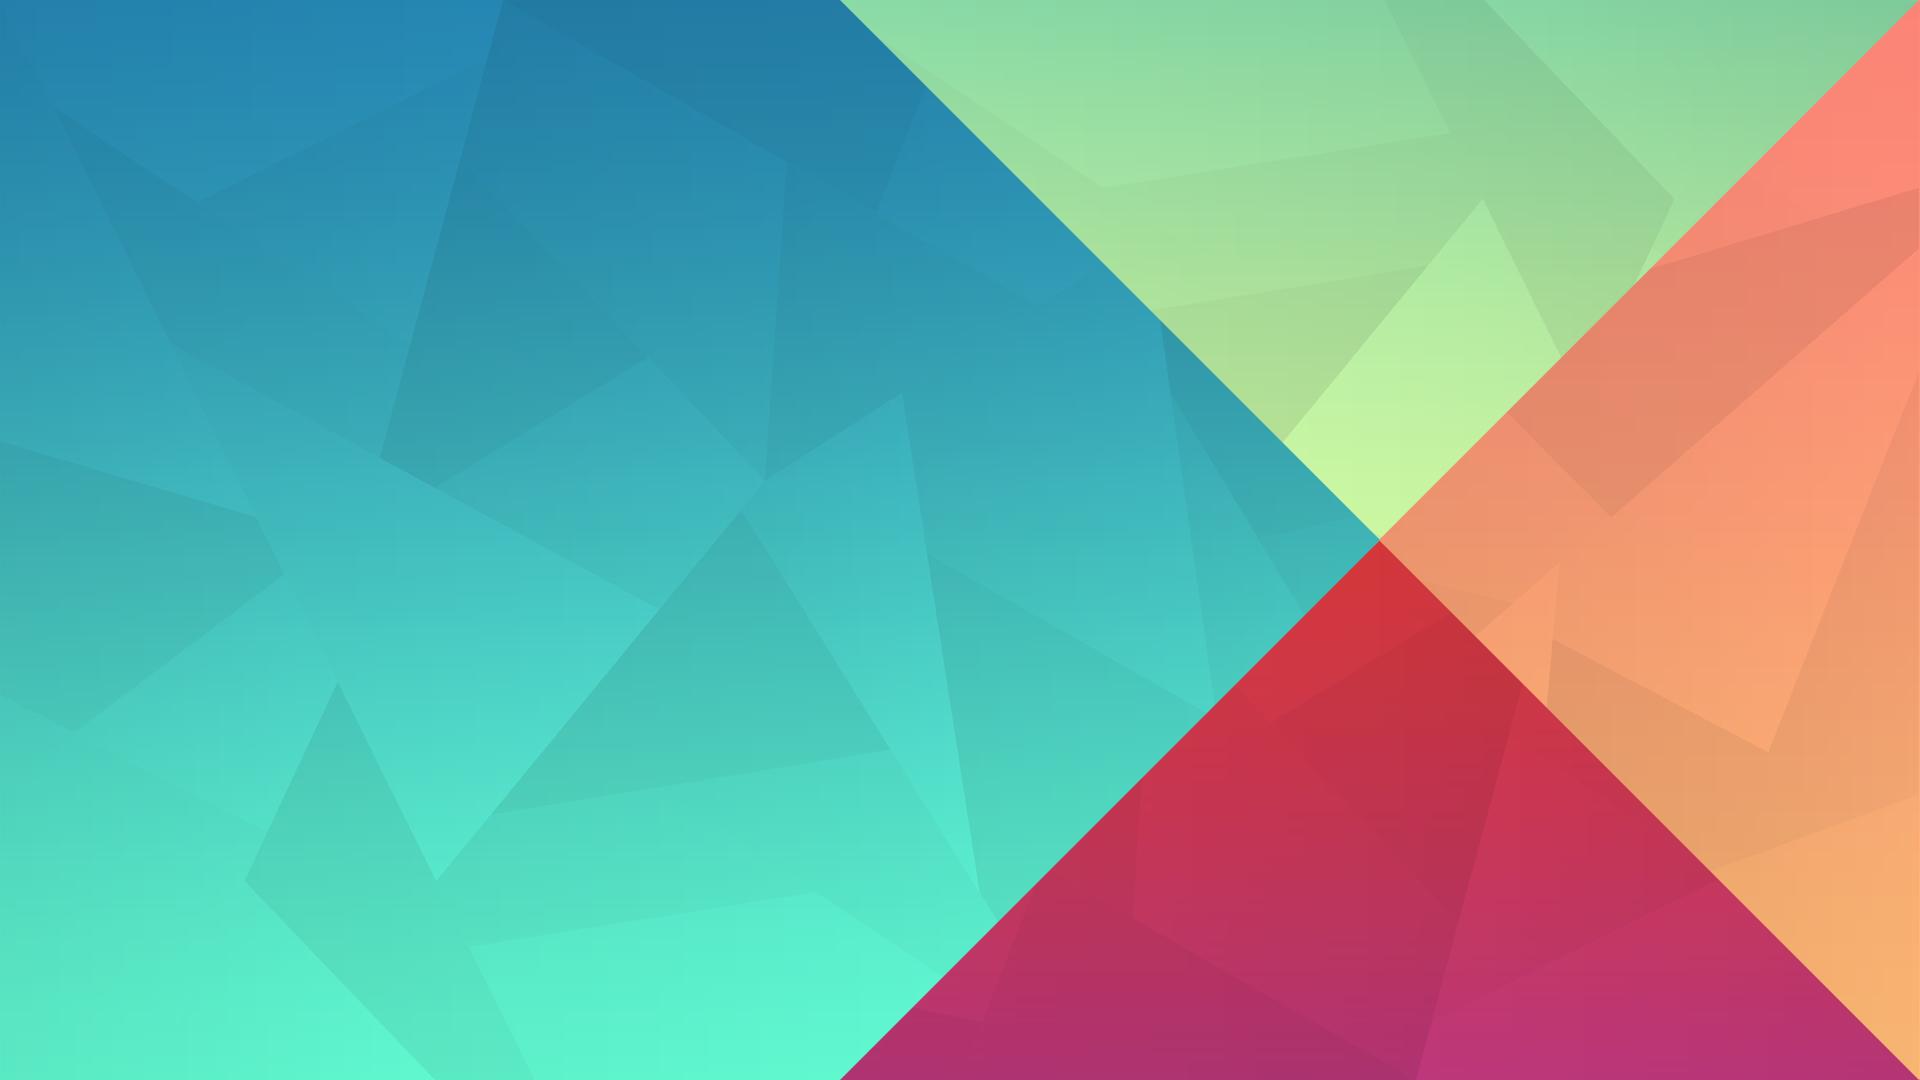 T Alphabet Wallpaper Hd Google Wallpapers Hd Pixelstalk Net